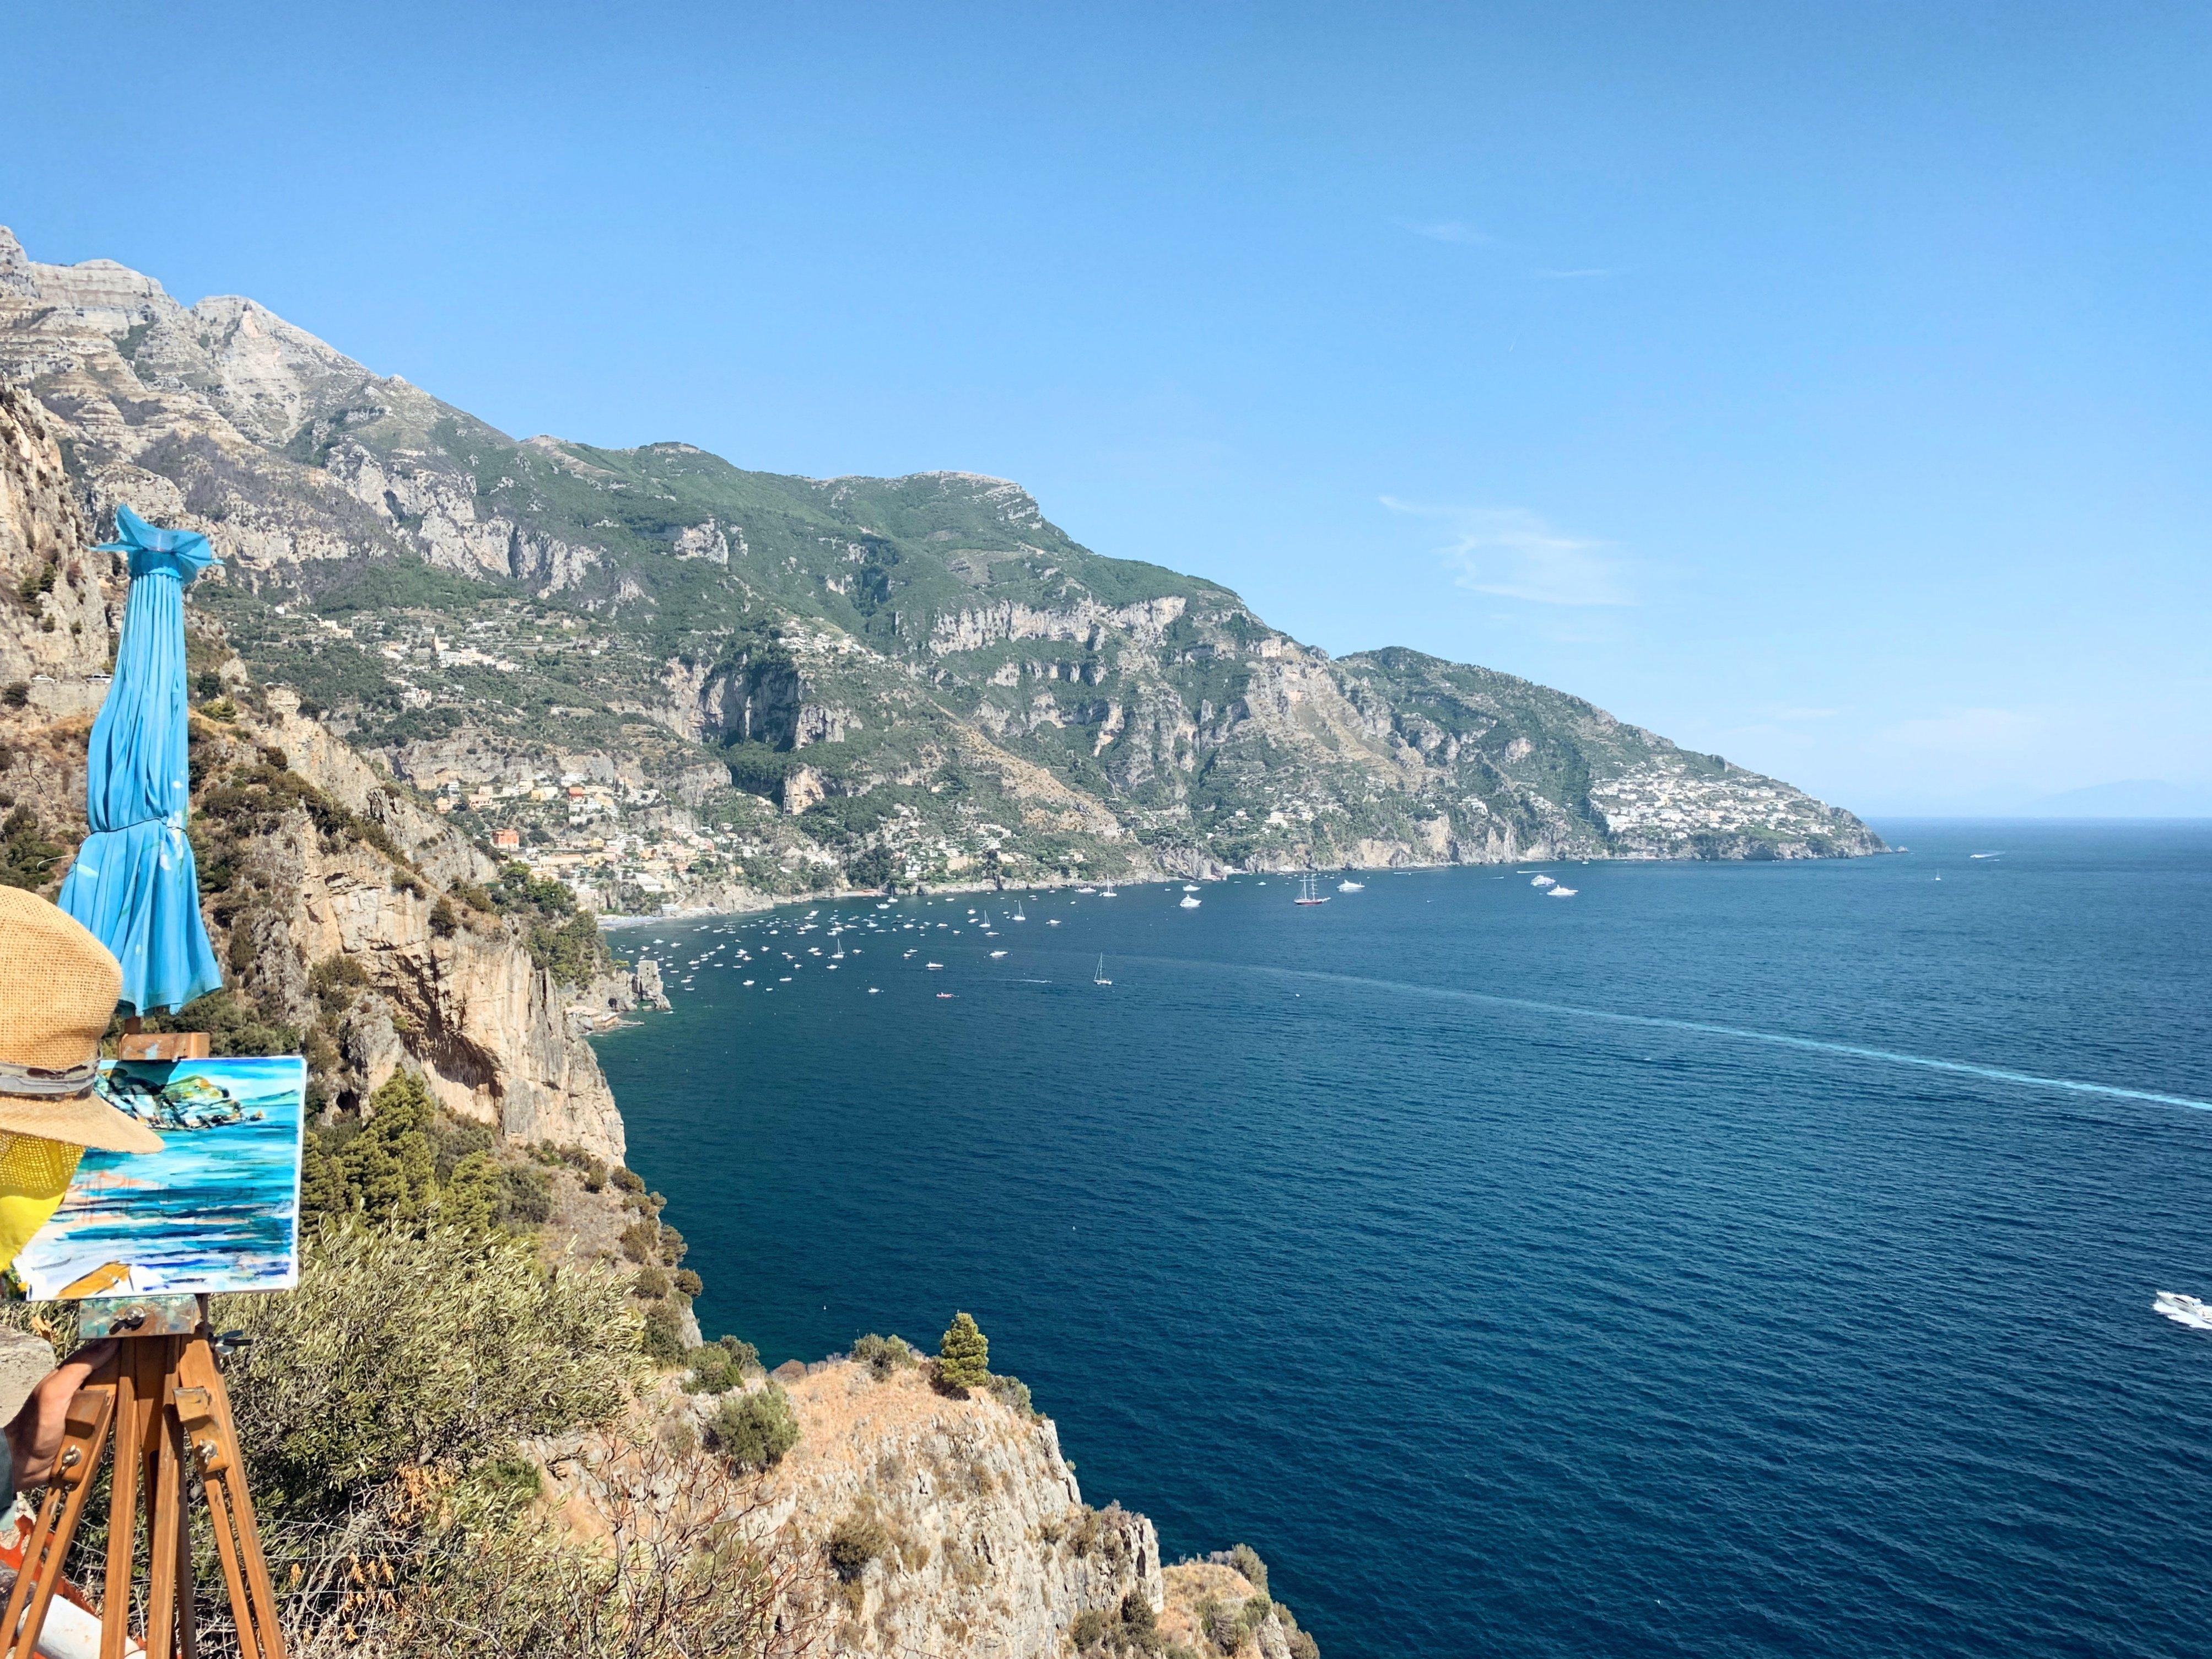 Amalfi Coast, postcard from Positano and Praiano